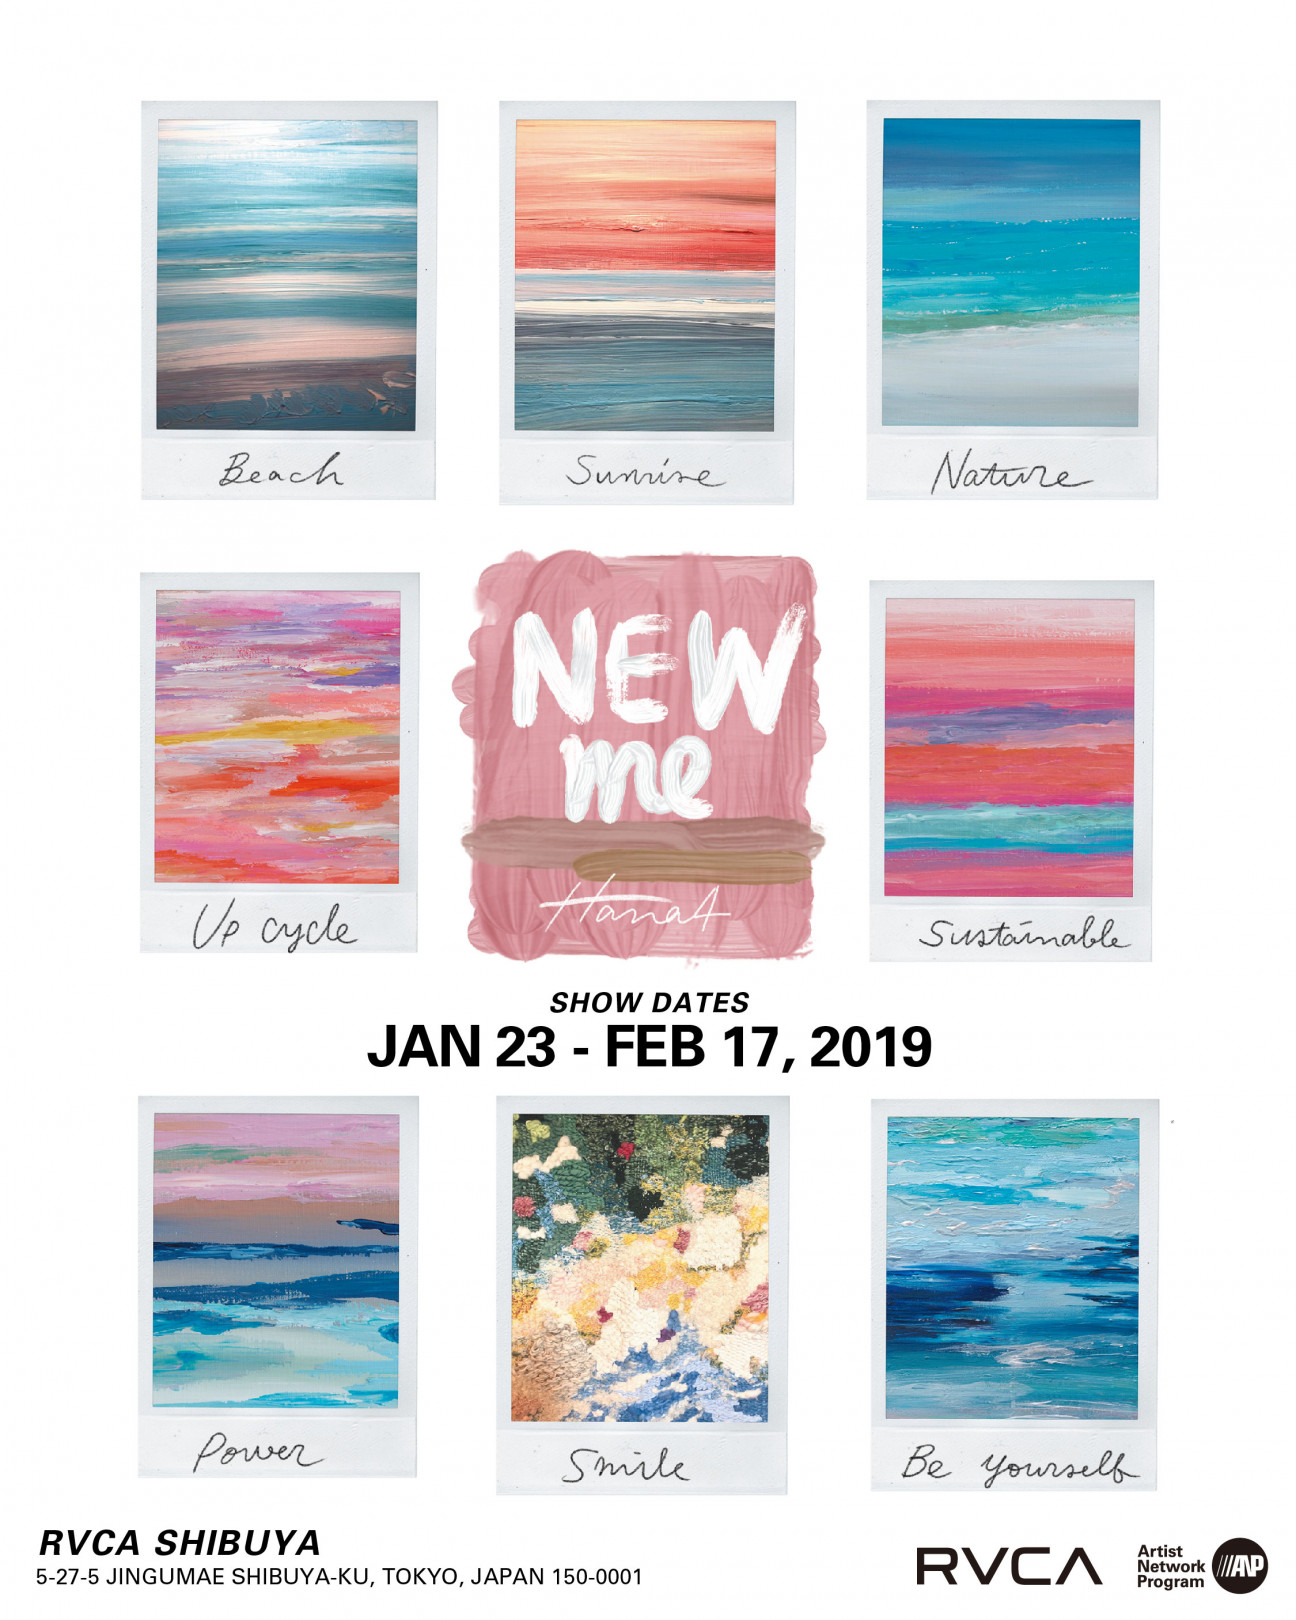 Hana4のアート展「NEW me」がRVCA SHIBUYA GALLERYにて開催中